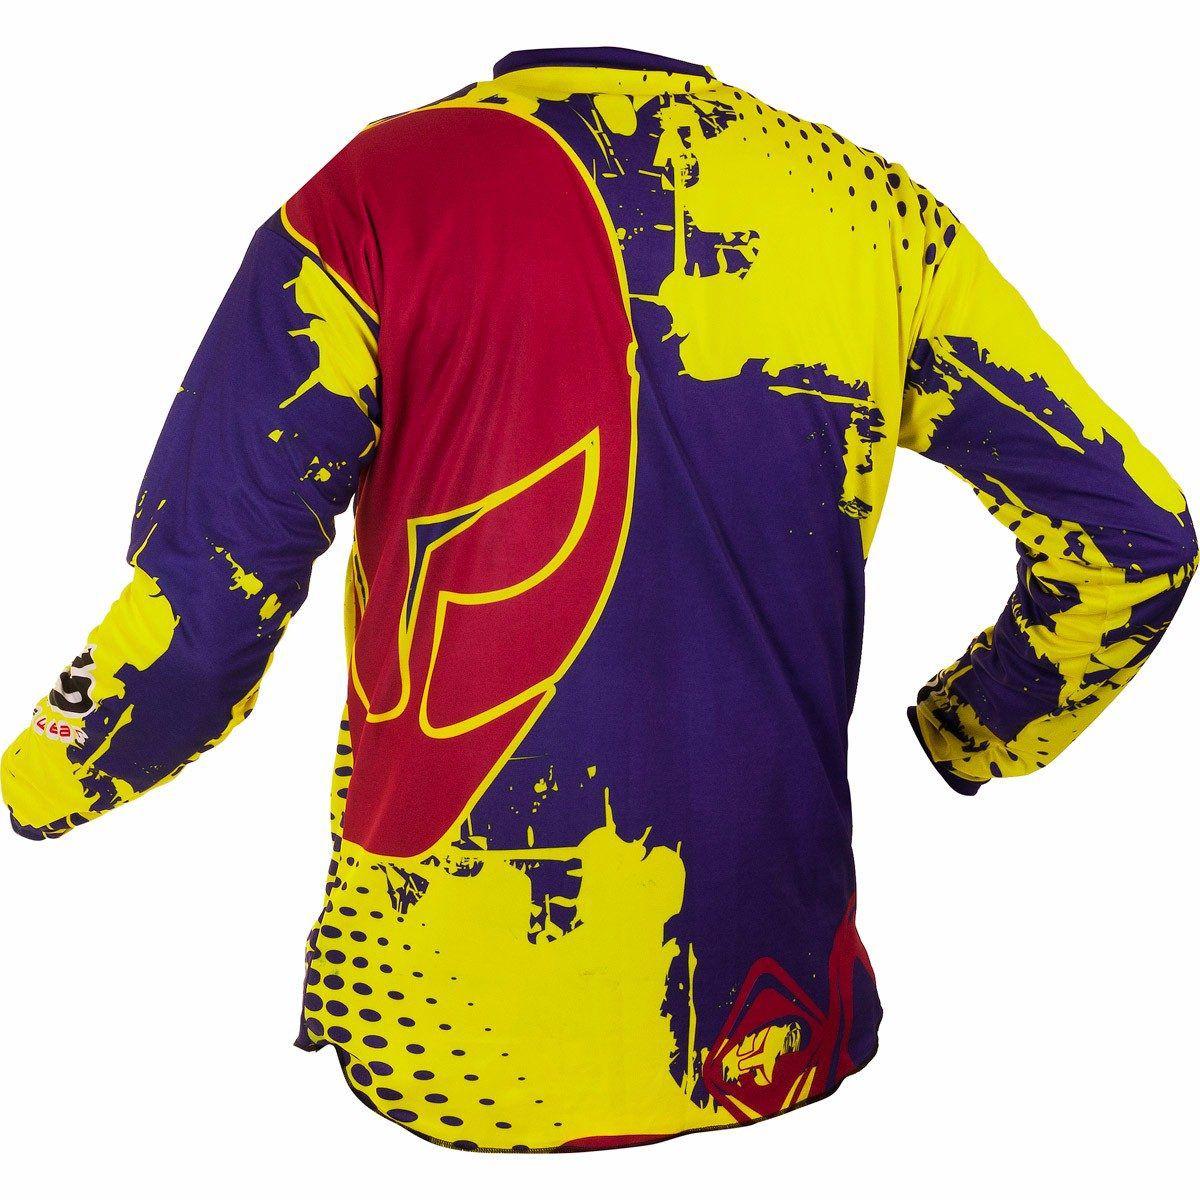 Camisa IMS Action Pro 2016